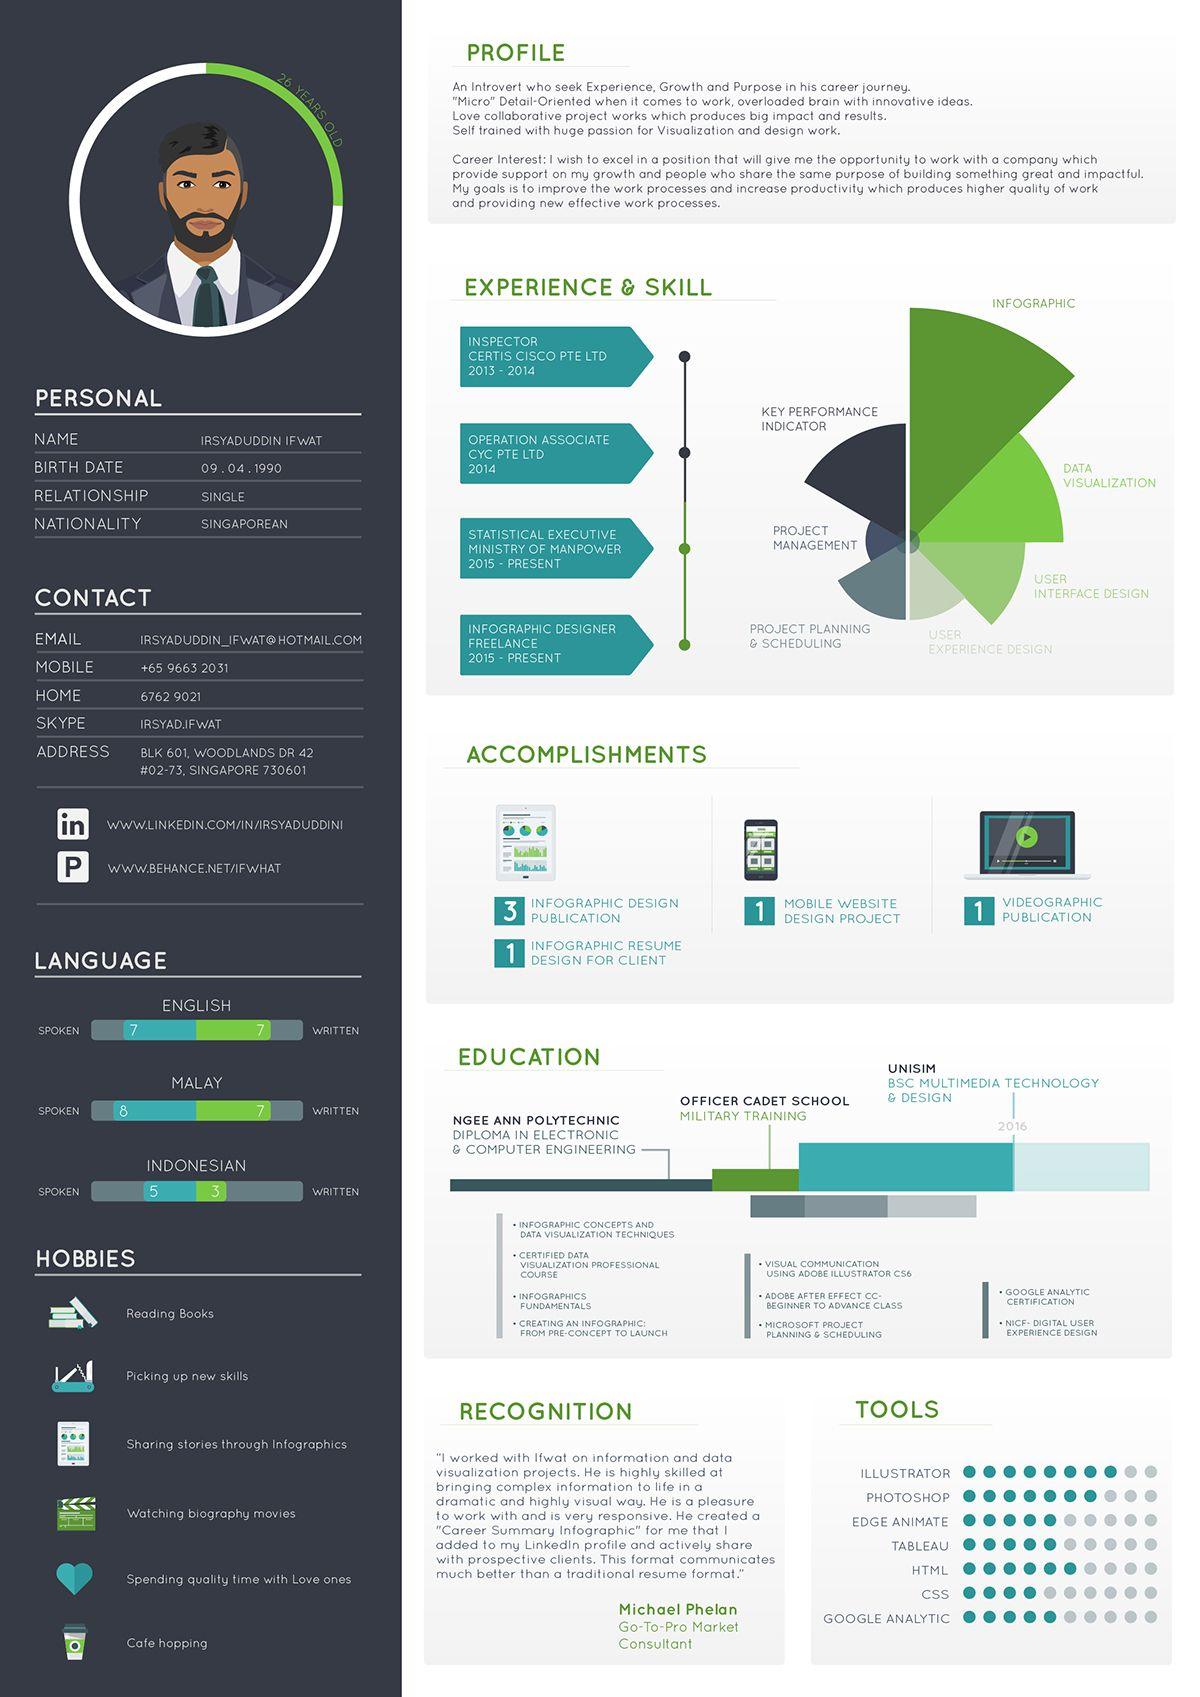 Irsyaduddin Ifwat Resume 2016 On Behance Graphic Resume Visual Resume Infographic Resume